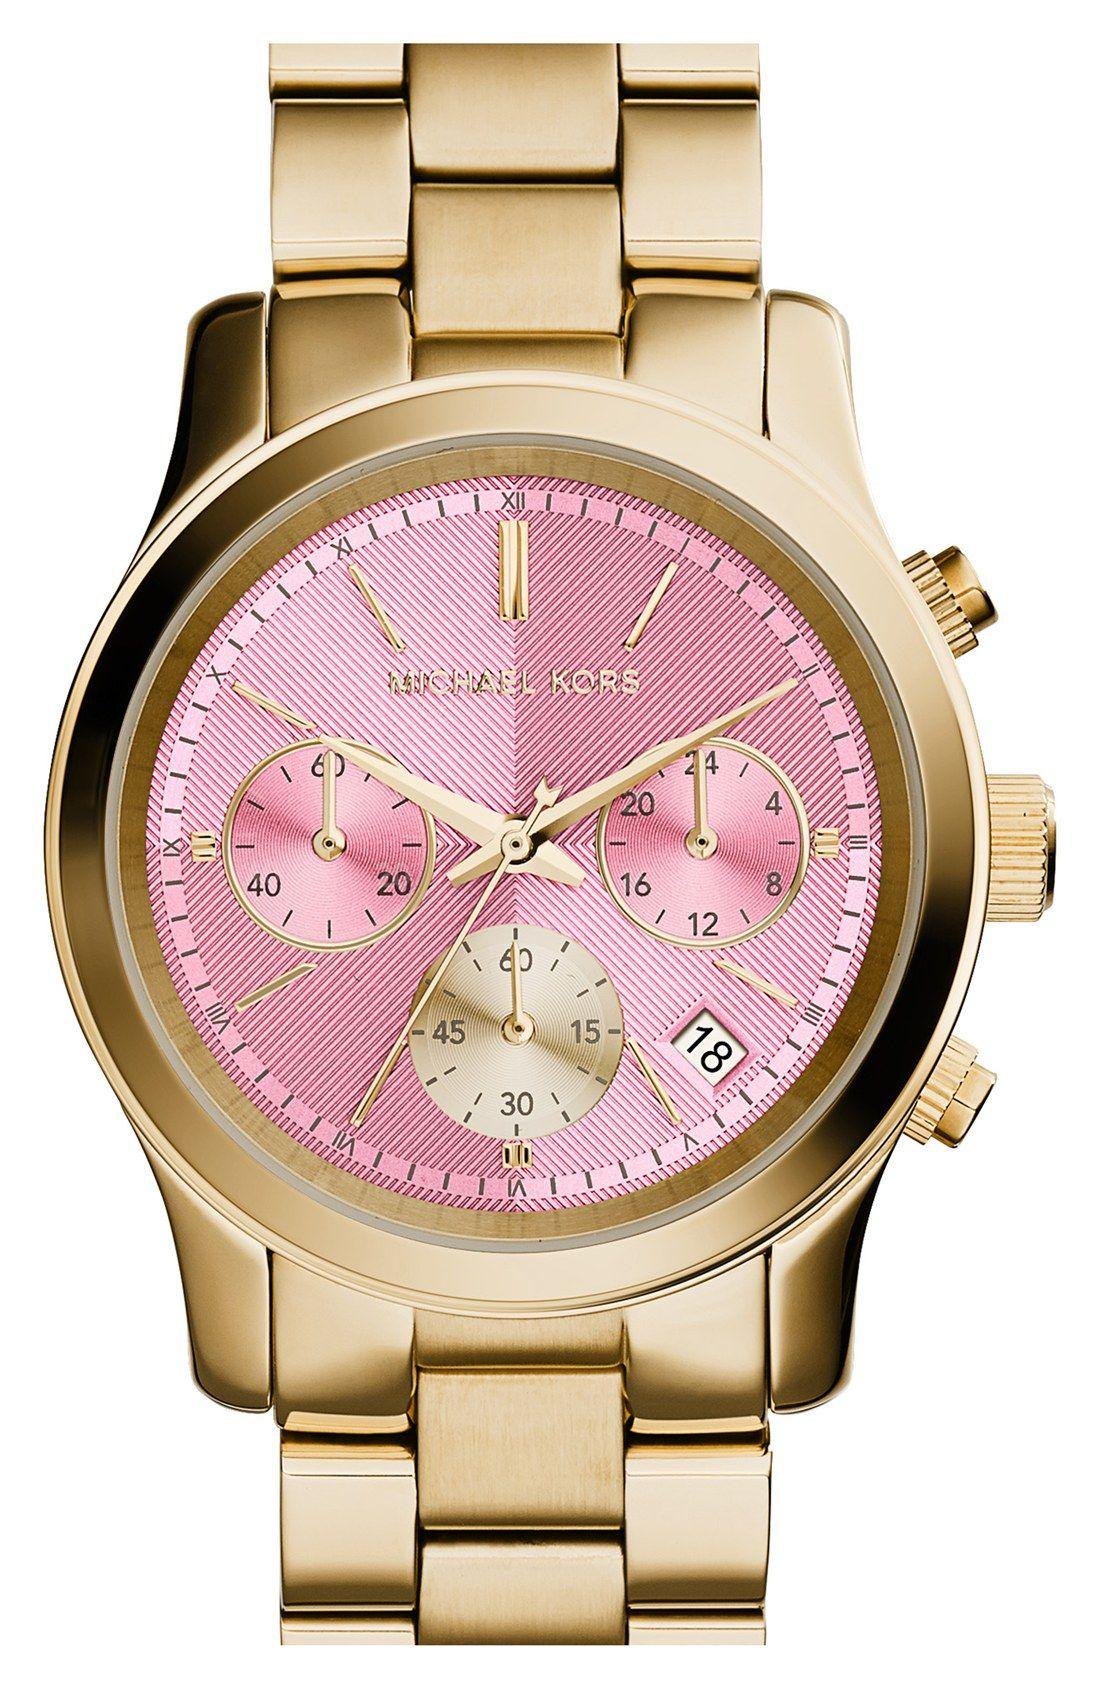 4ed5b7b4a4e4f Michael Kors      Lovii U   Pinterest   Relógios, Acessórios e Watches